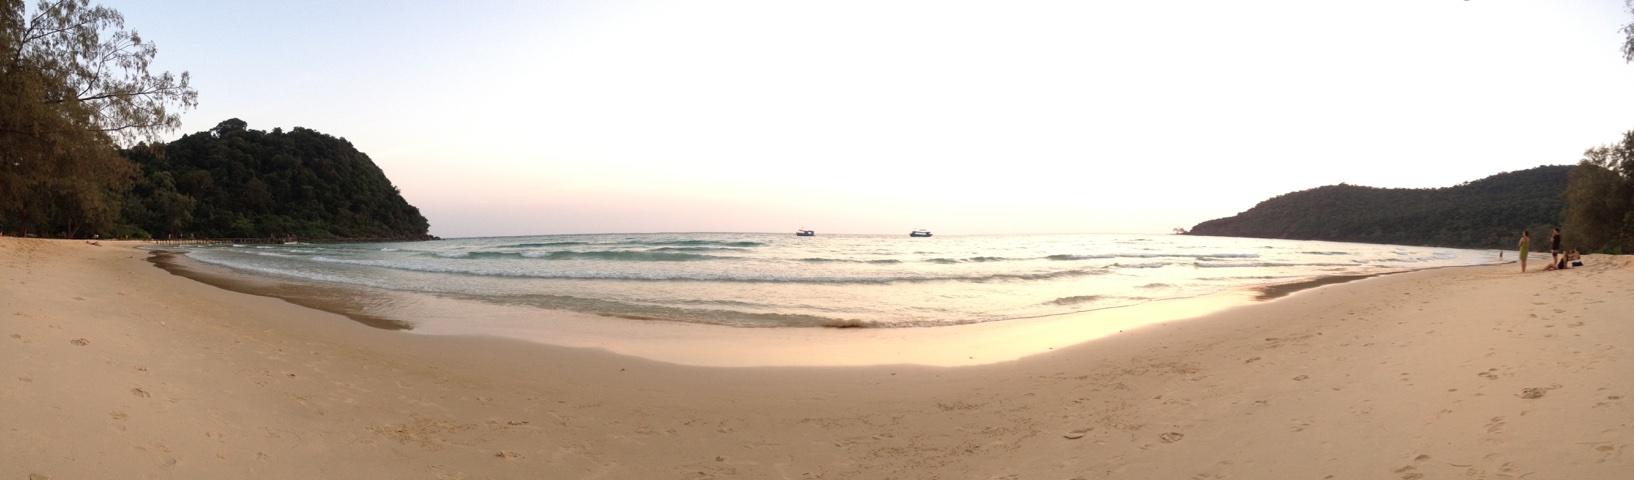 A panorama of Lazy Beach on Koh Rong Samloem